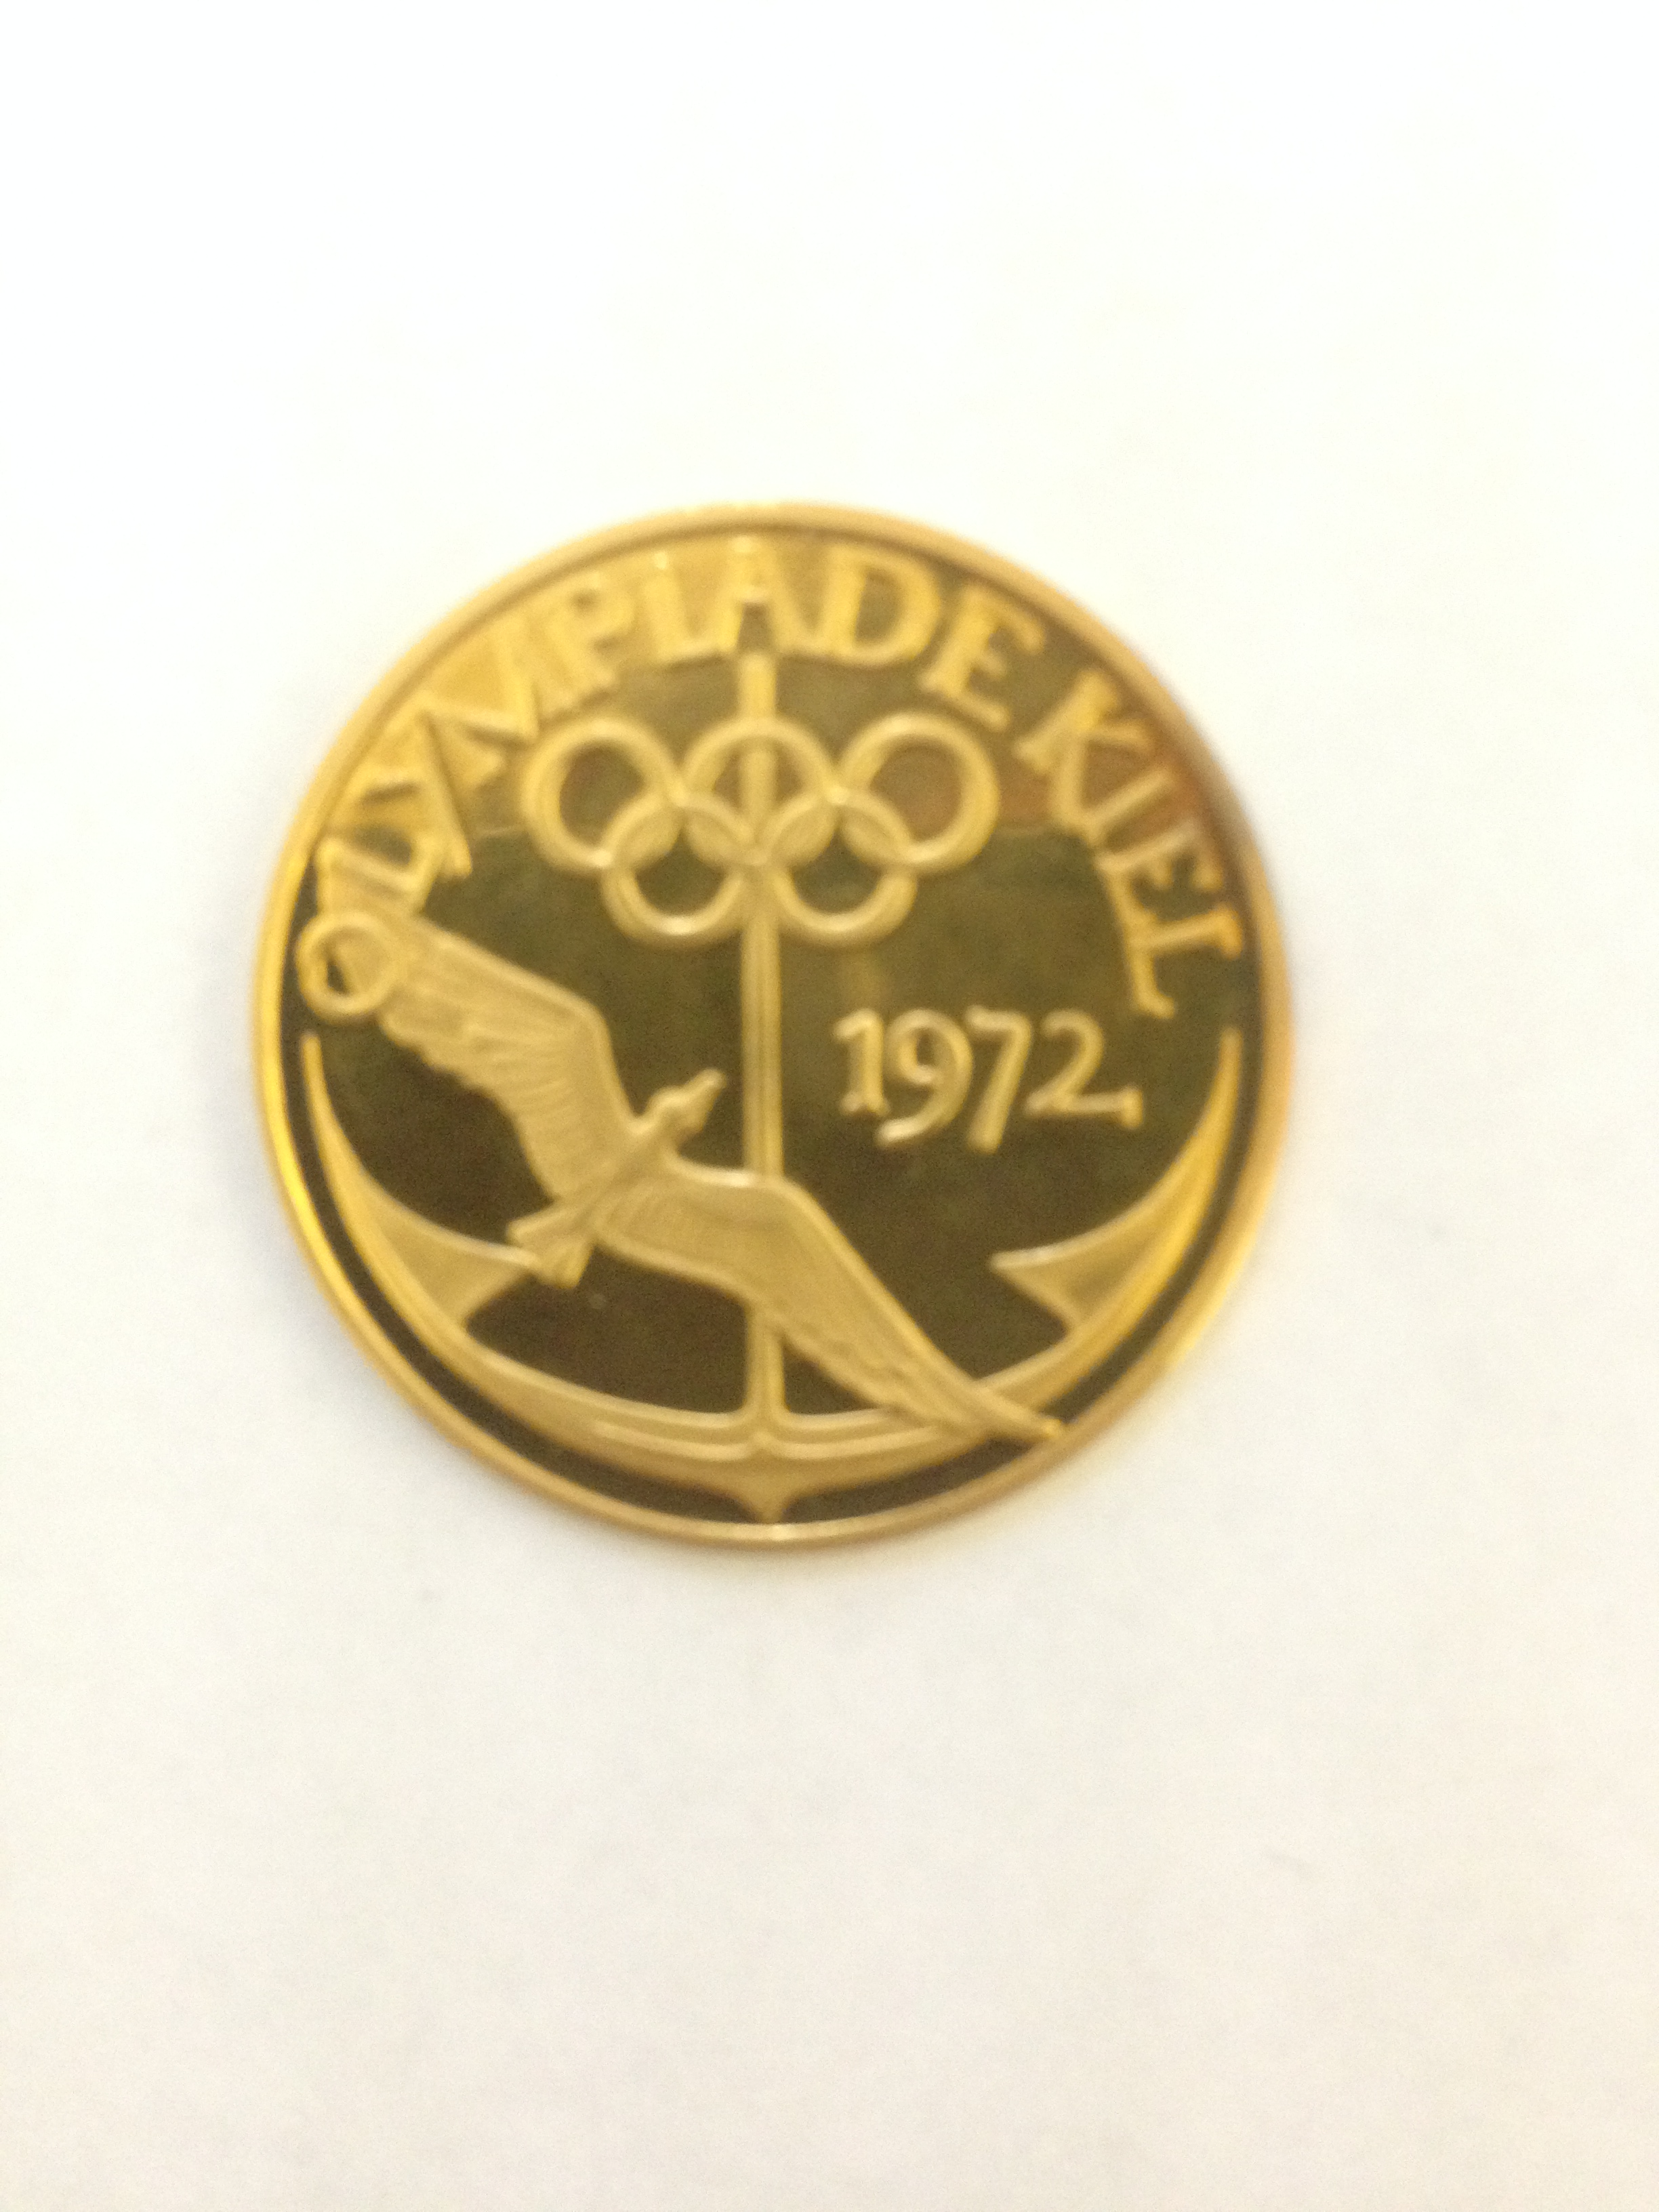 Olympiade Kiel 1972 Goldmünze